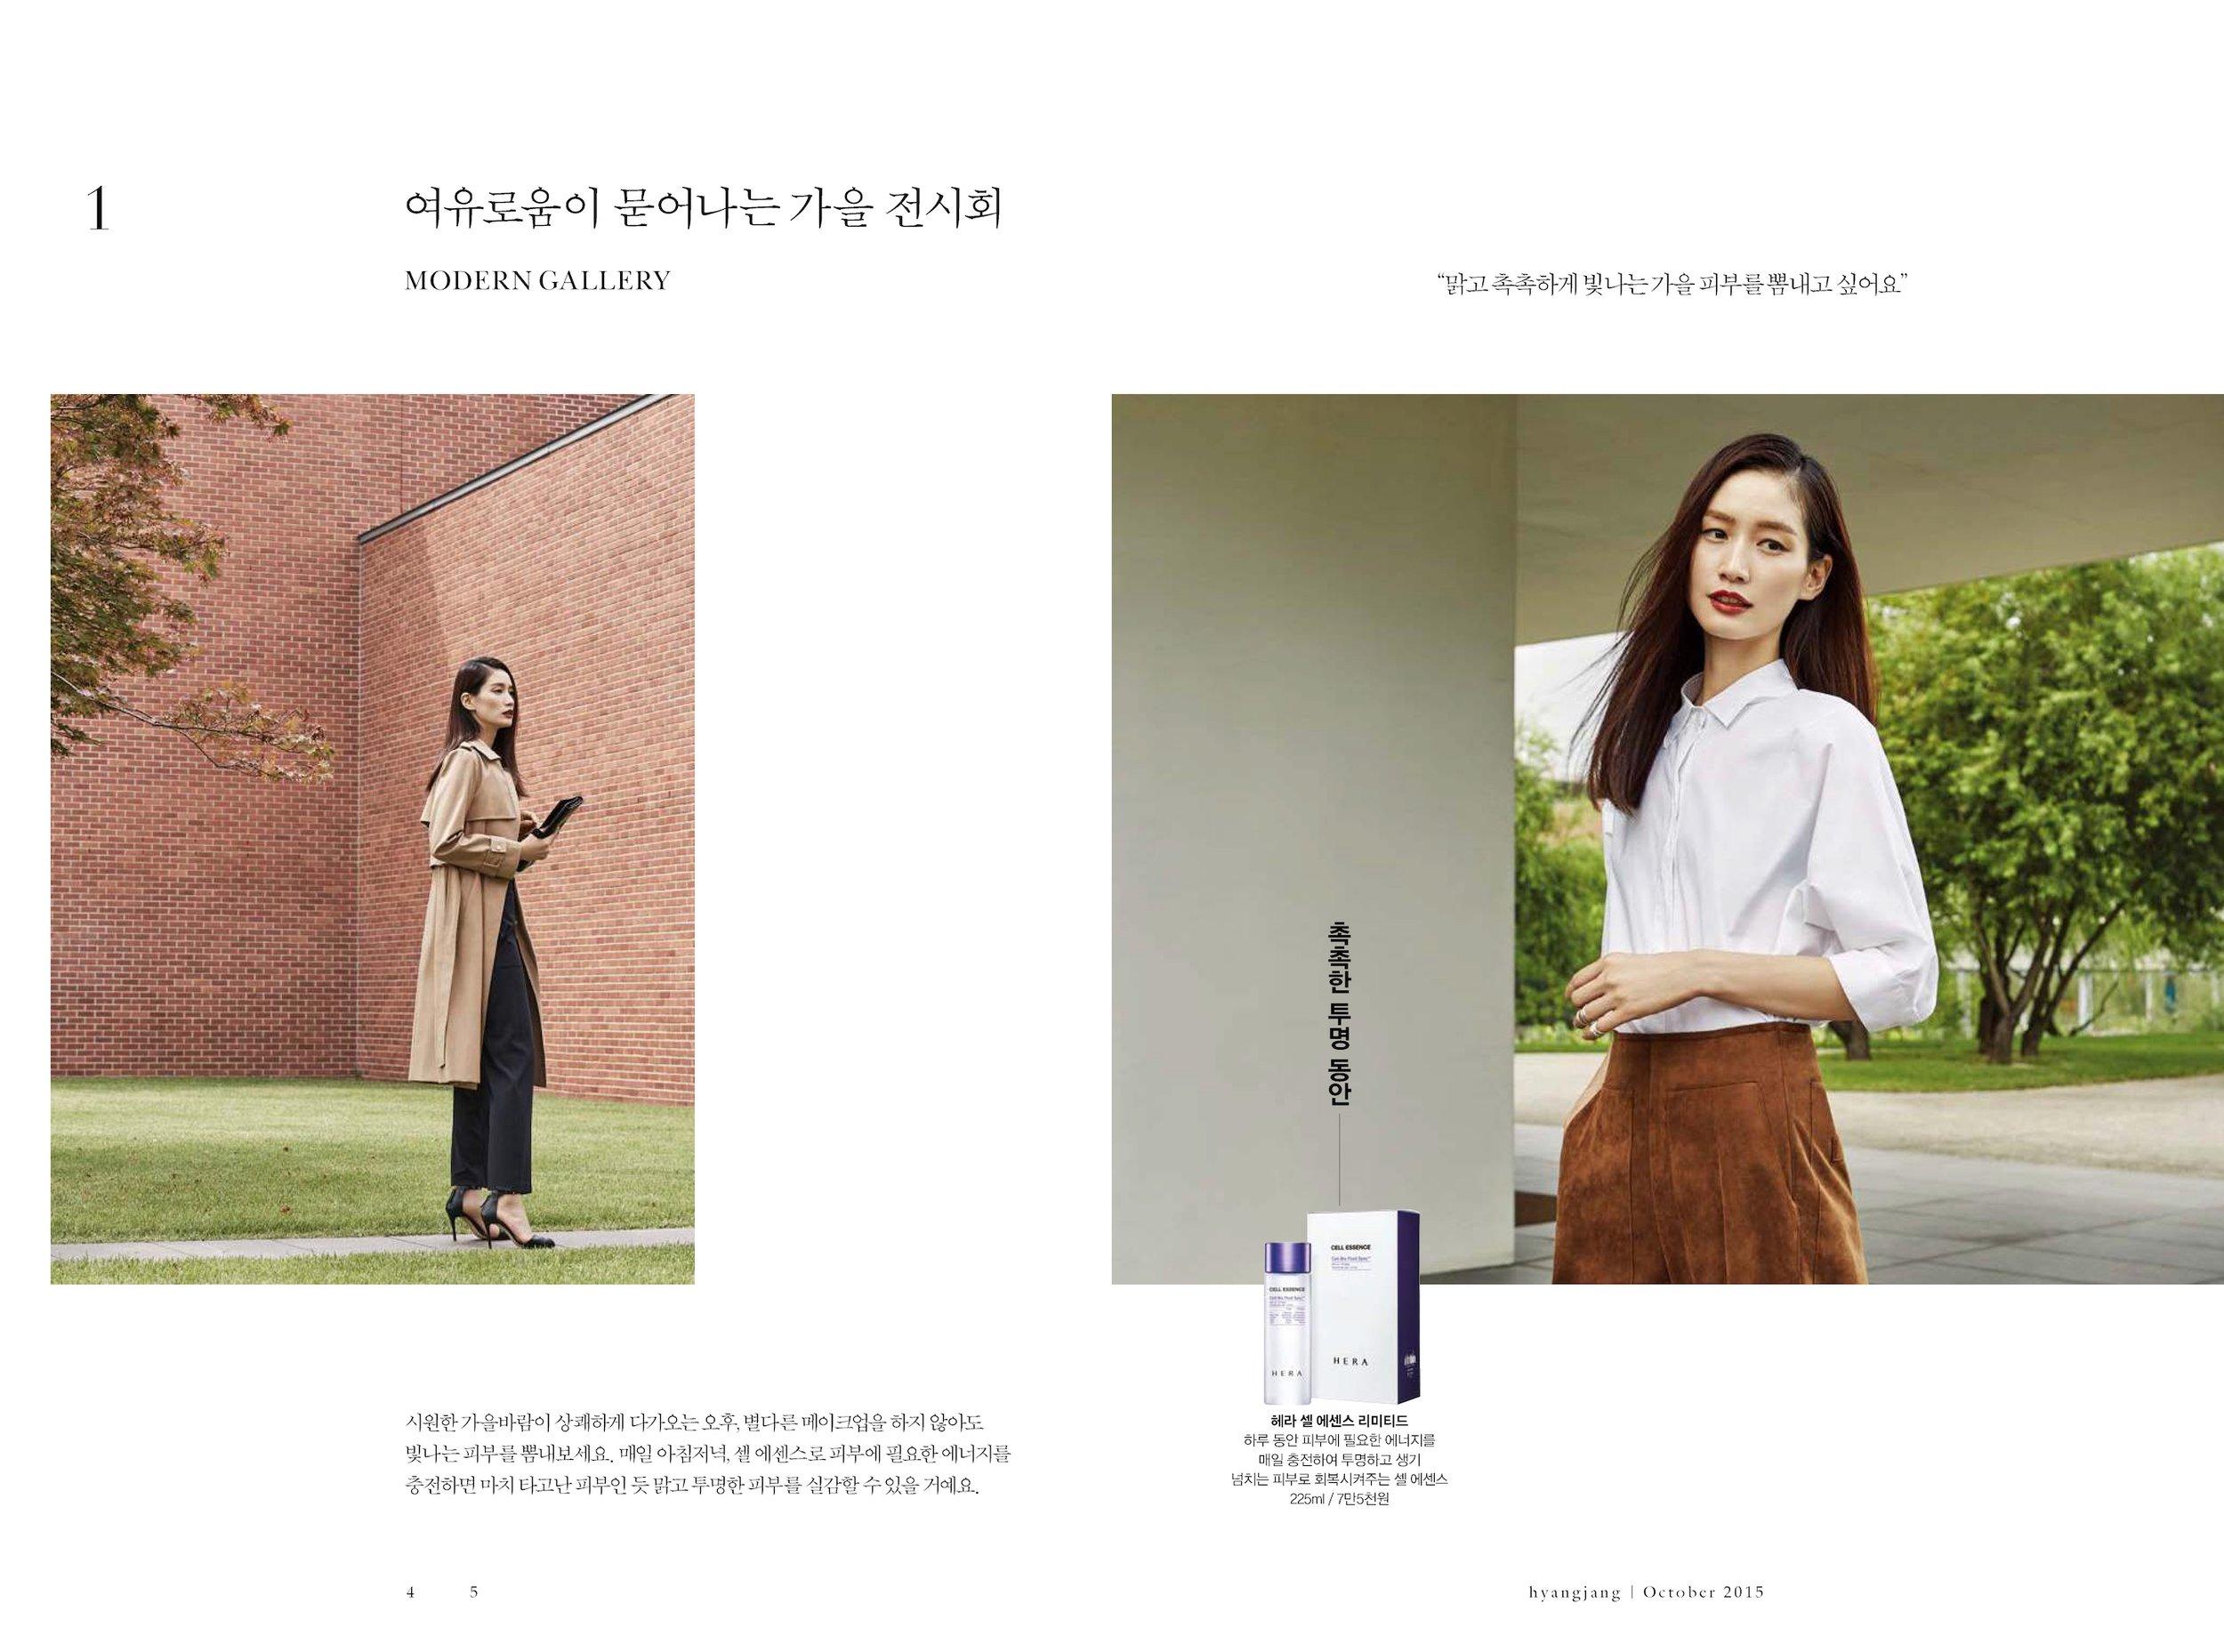 hyangjang-201510_페이지_02.jpeg